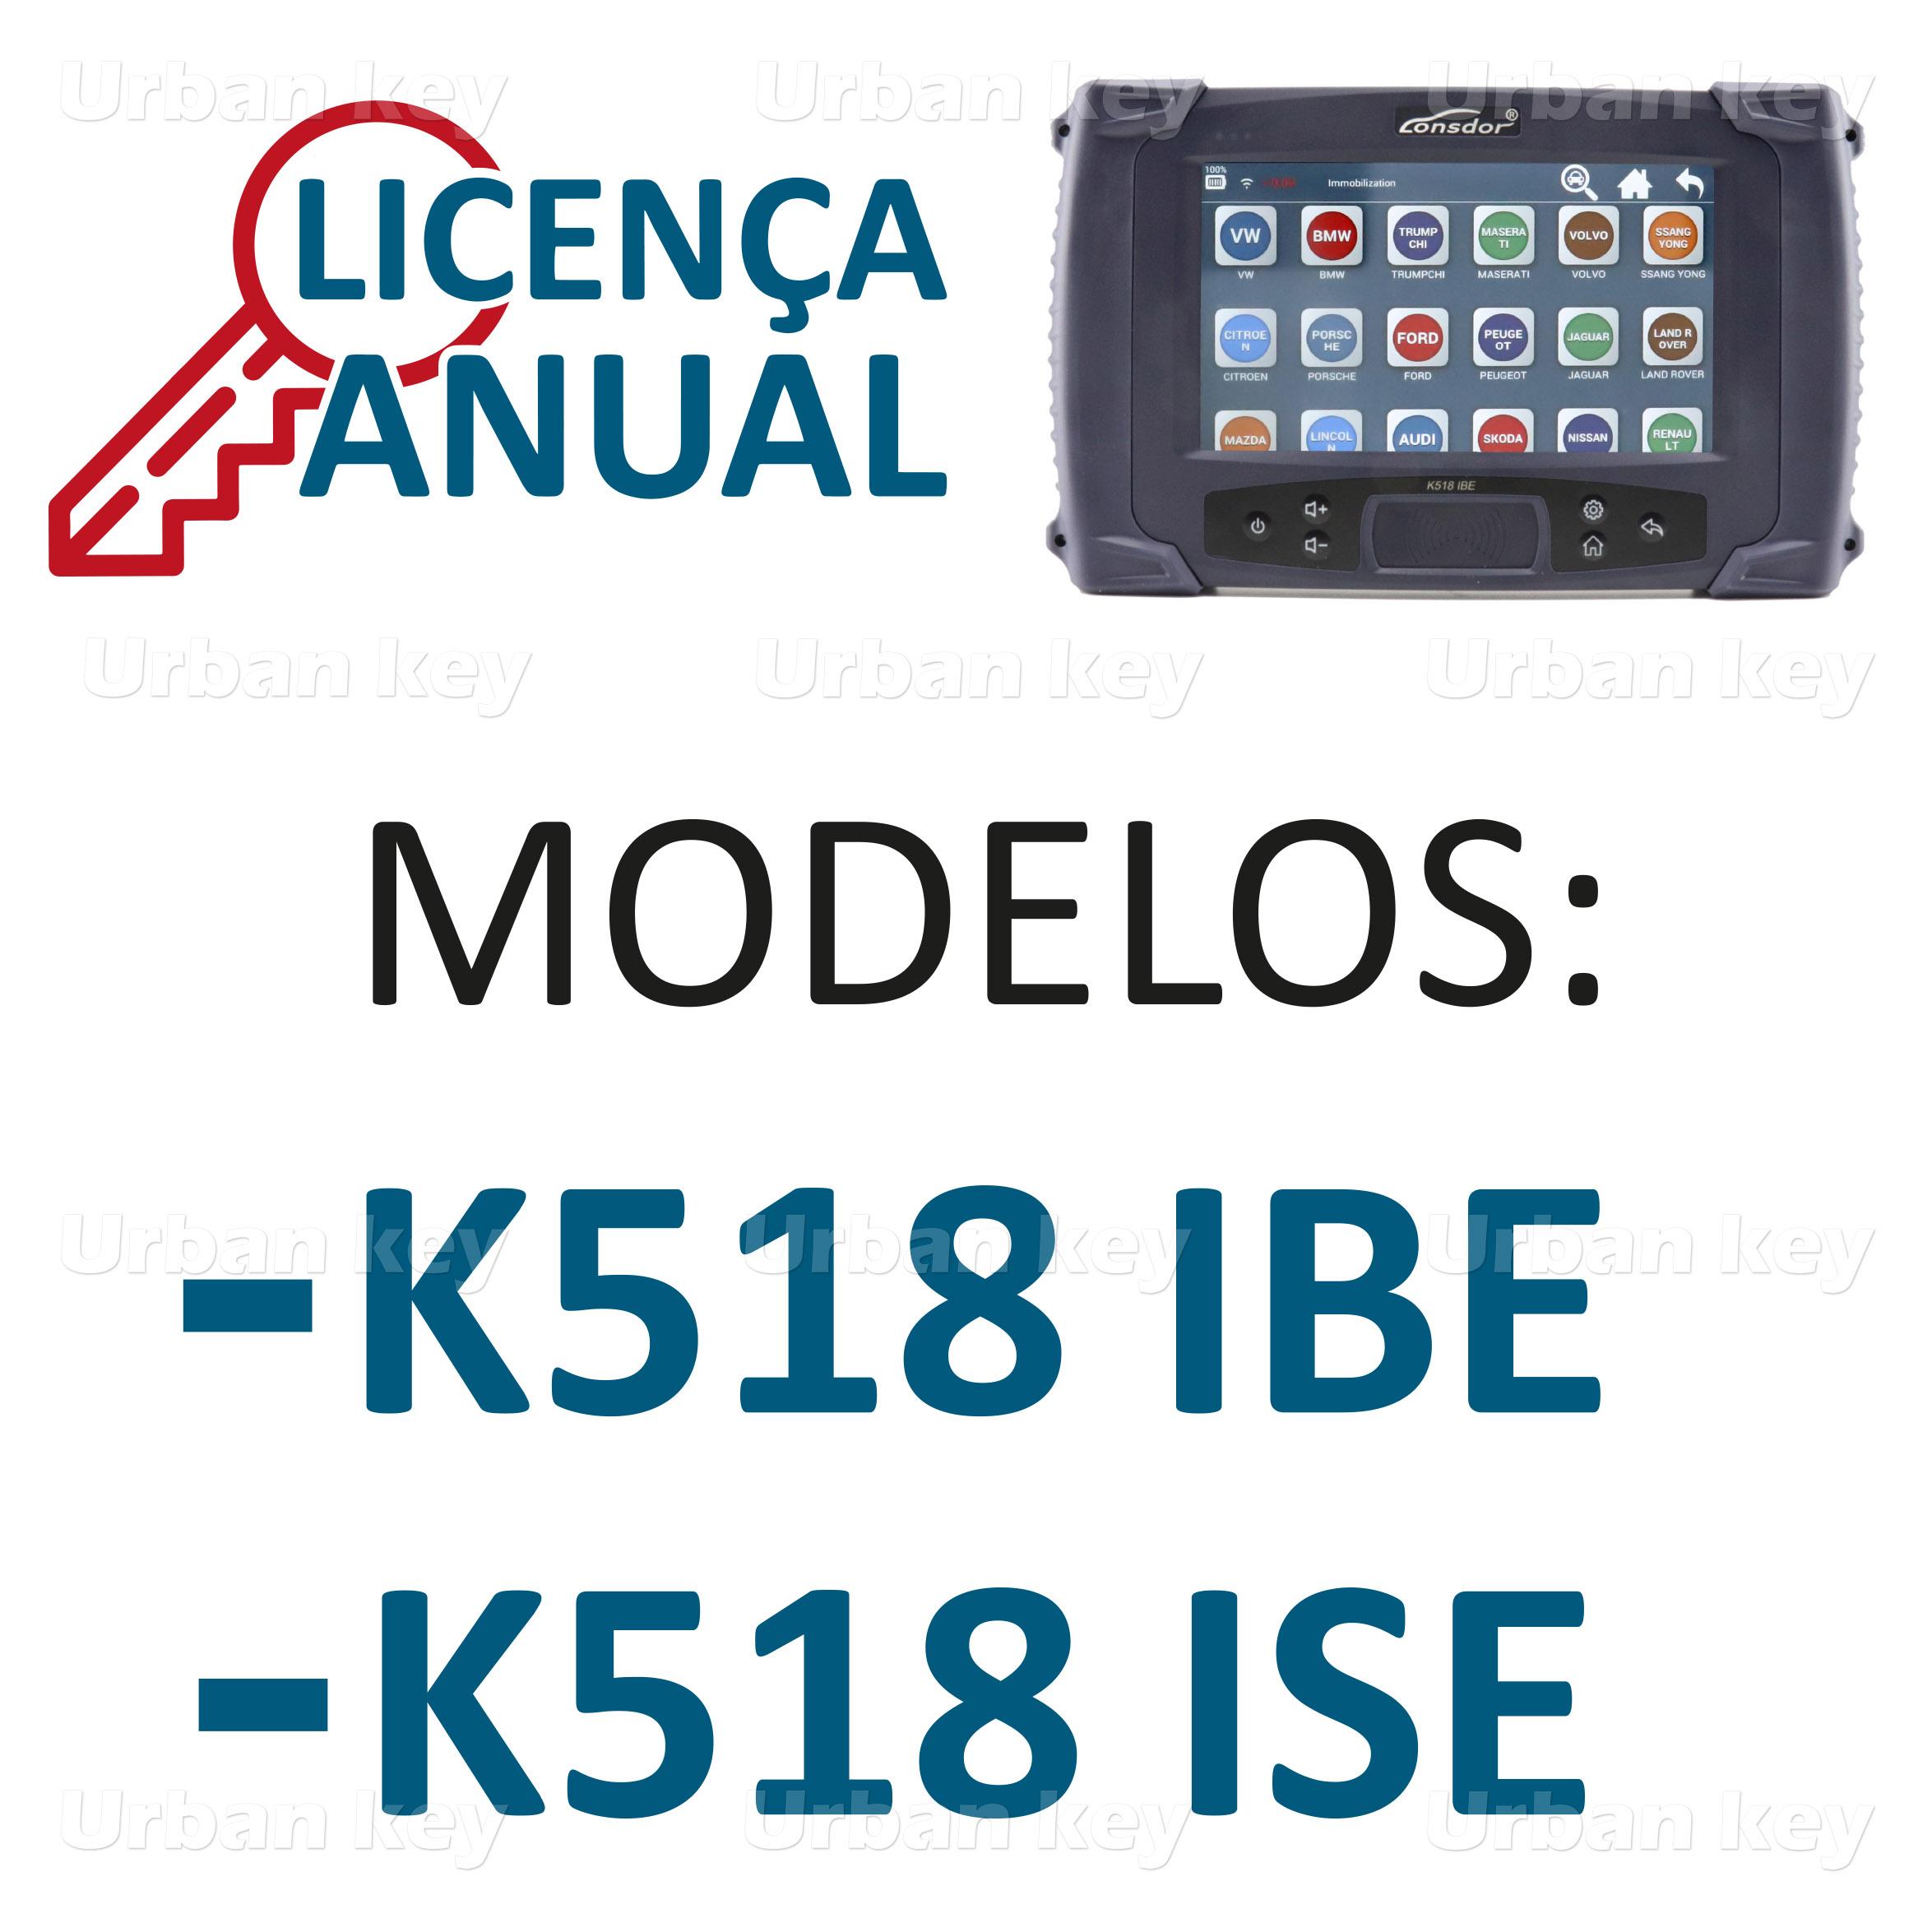 LICENCA ANUAL LONSDOR K518_IBE_ISE